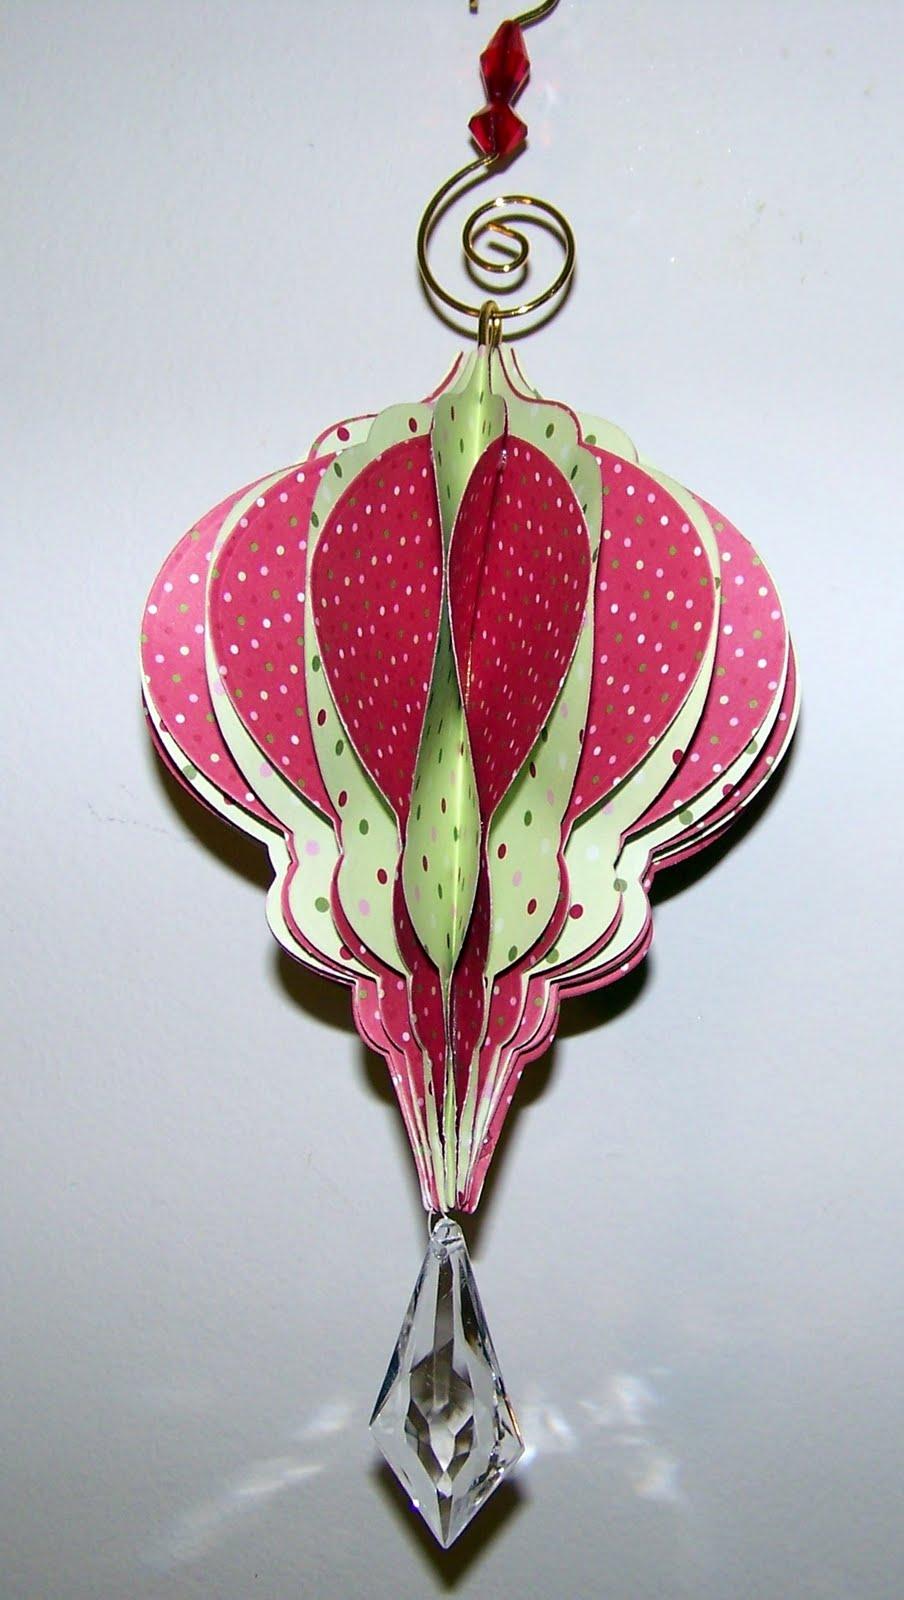 Ann Greenspan's Crafts: Honeycomb Ornaments - Wed, Dec. 21 ...